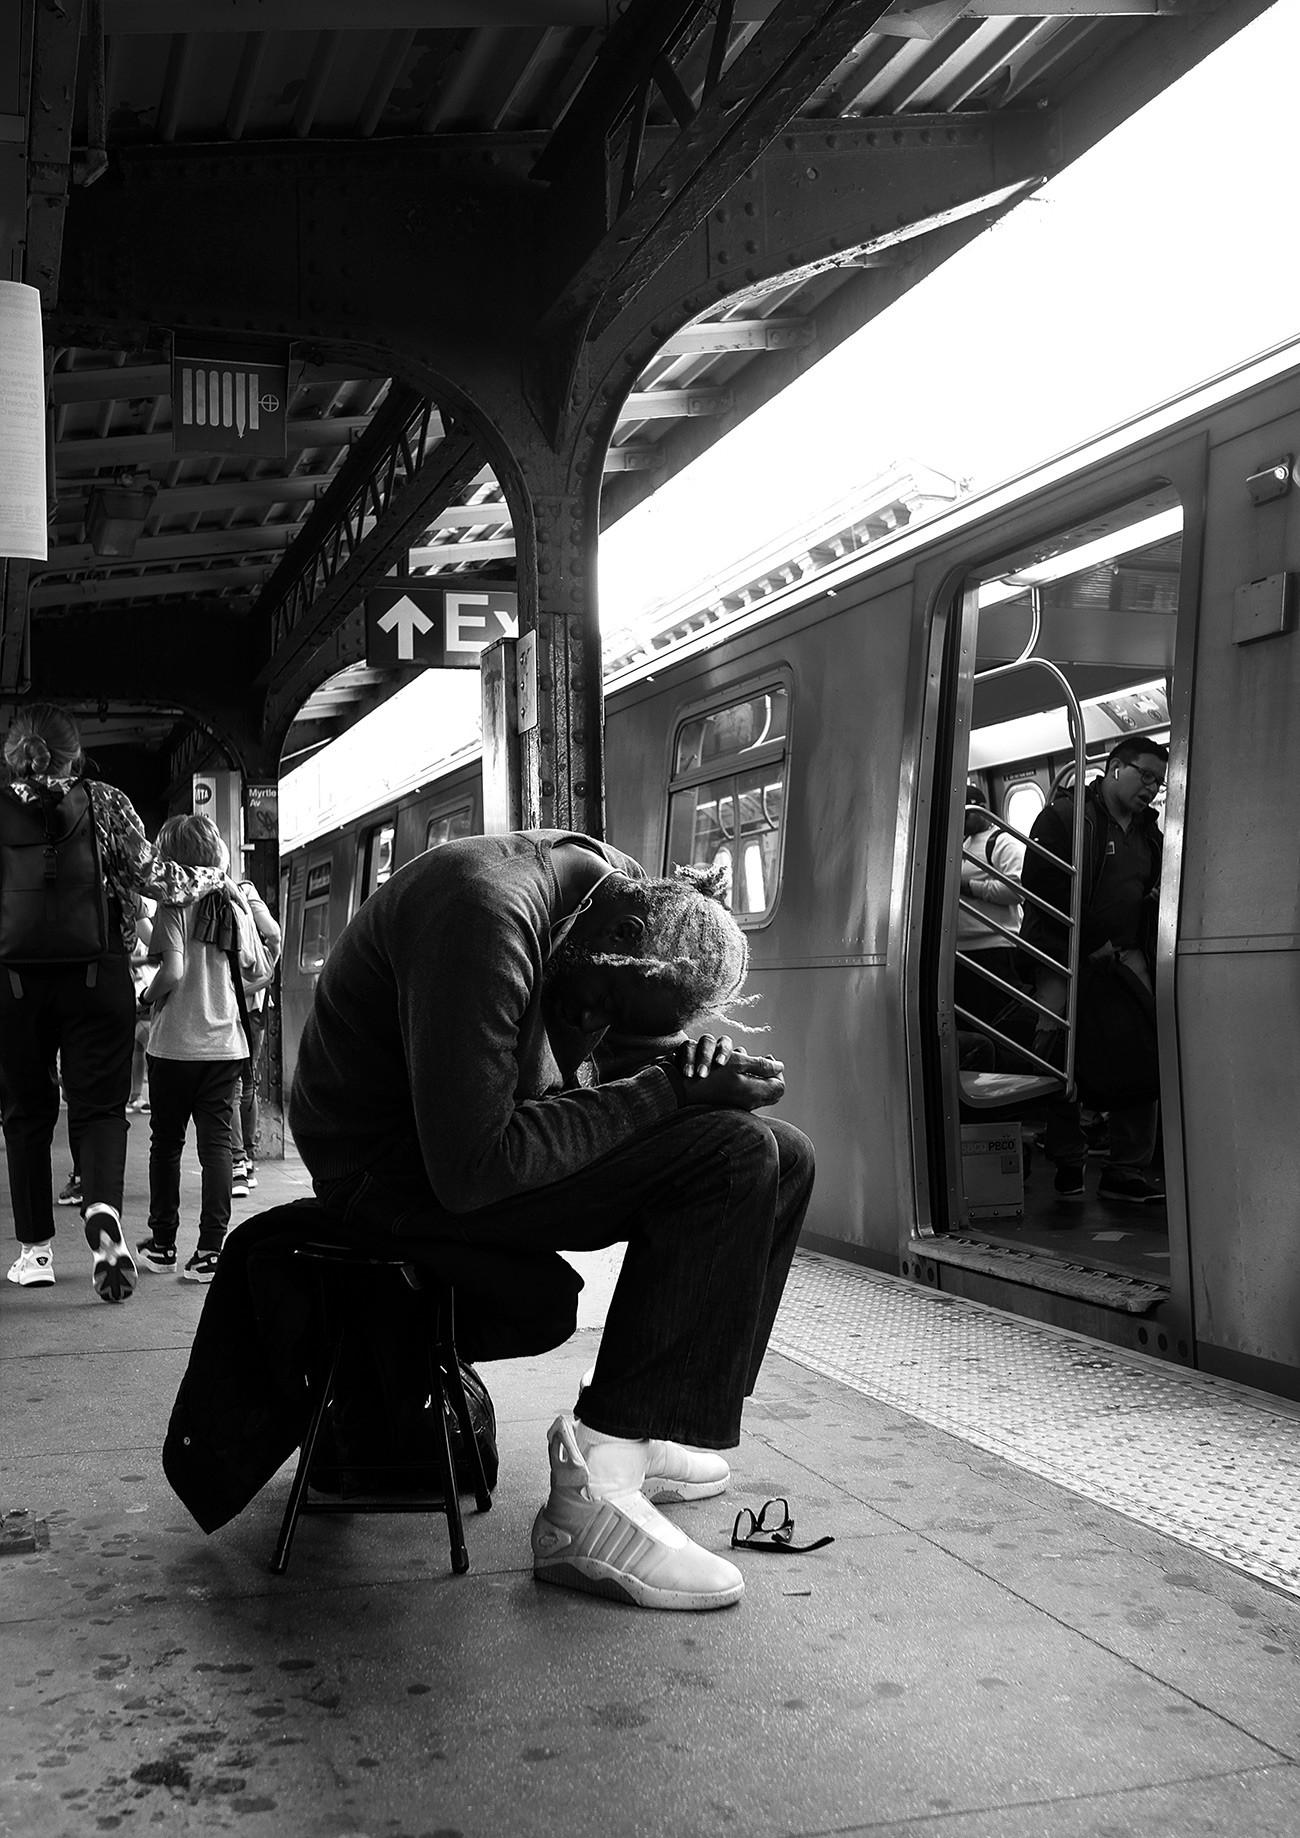 A man sleeping on a platform